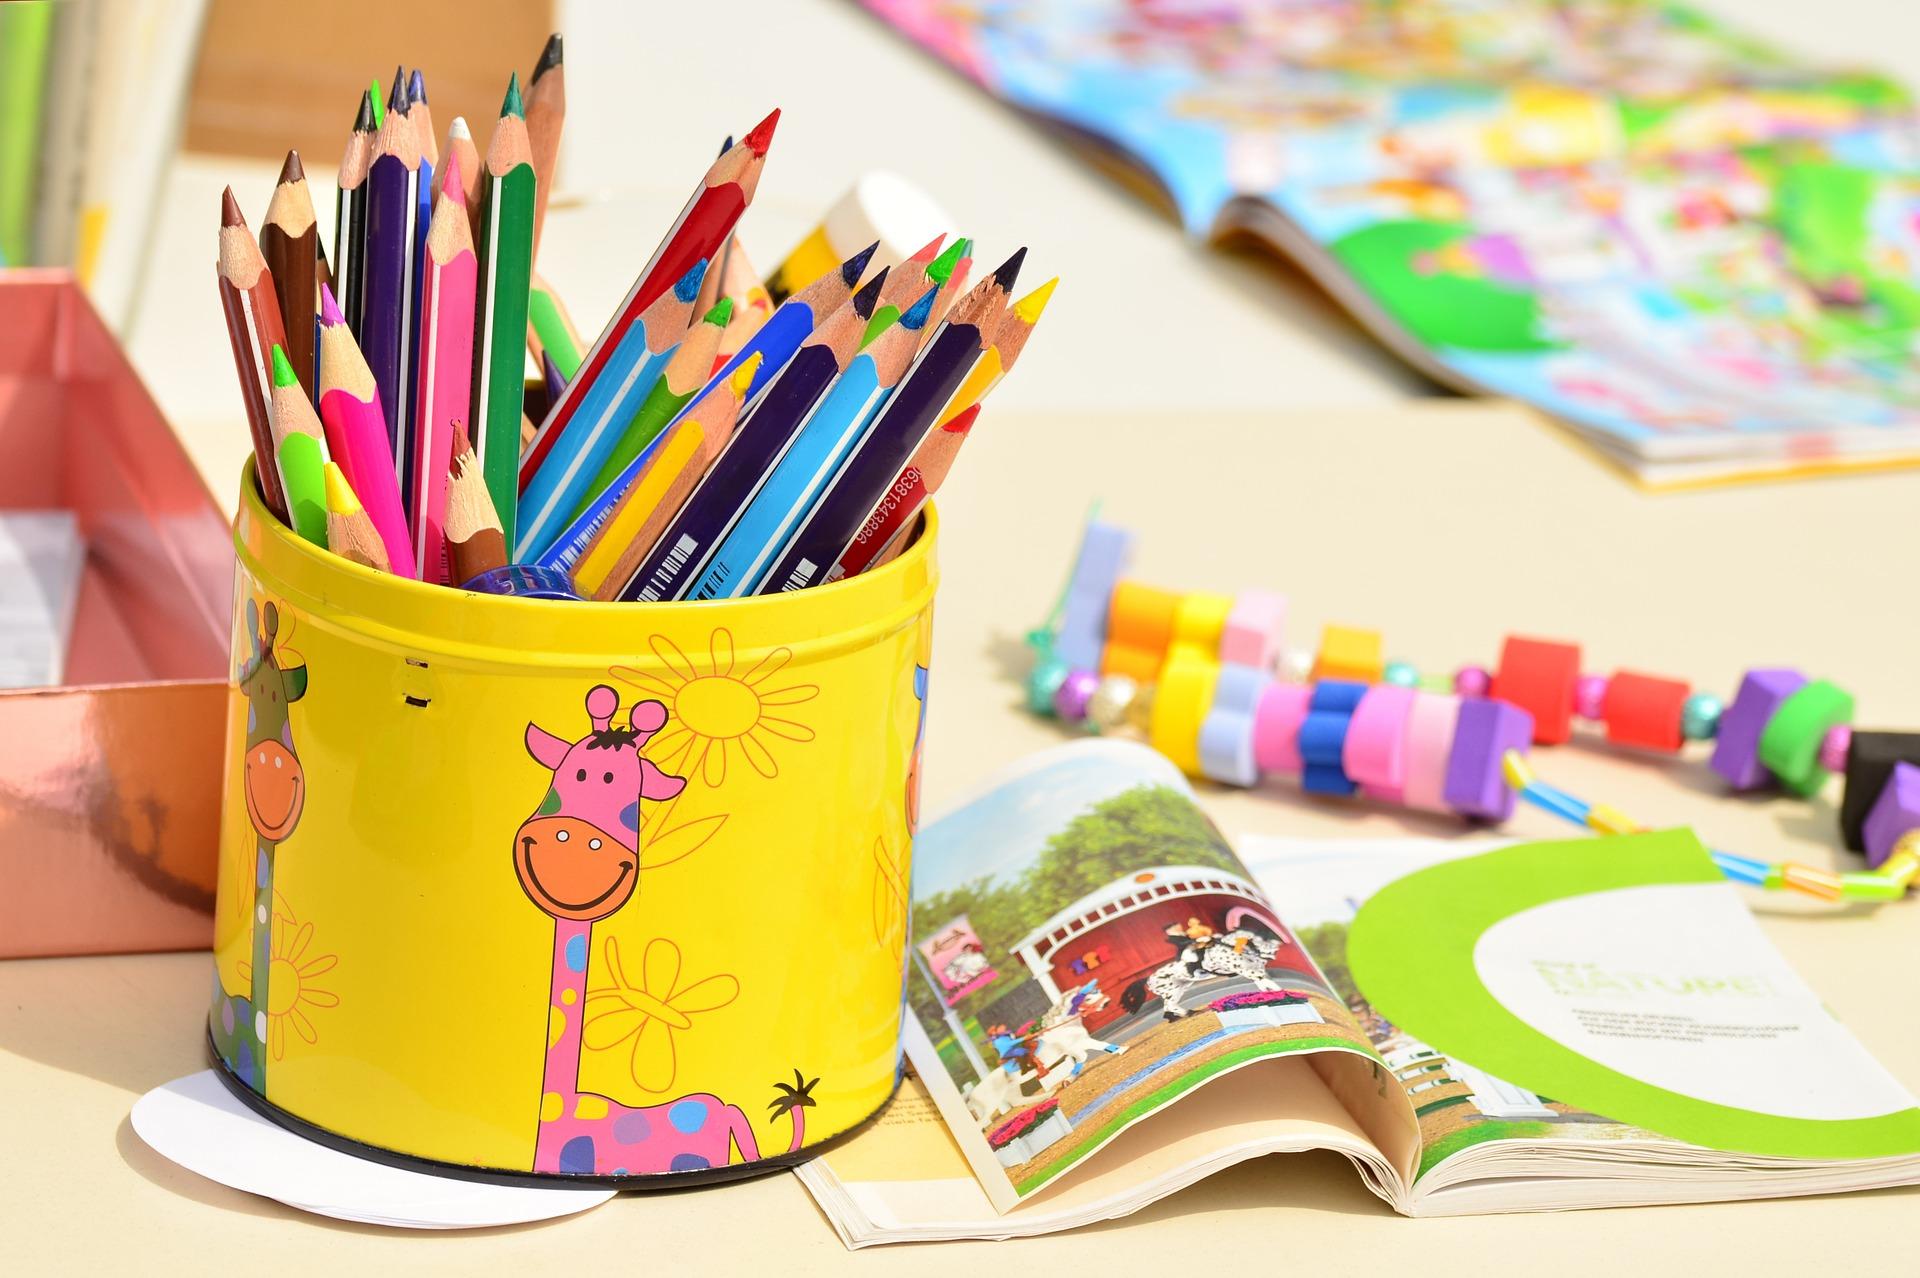 colored-pencils-1506589_1920